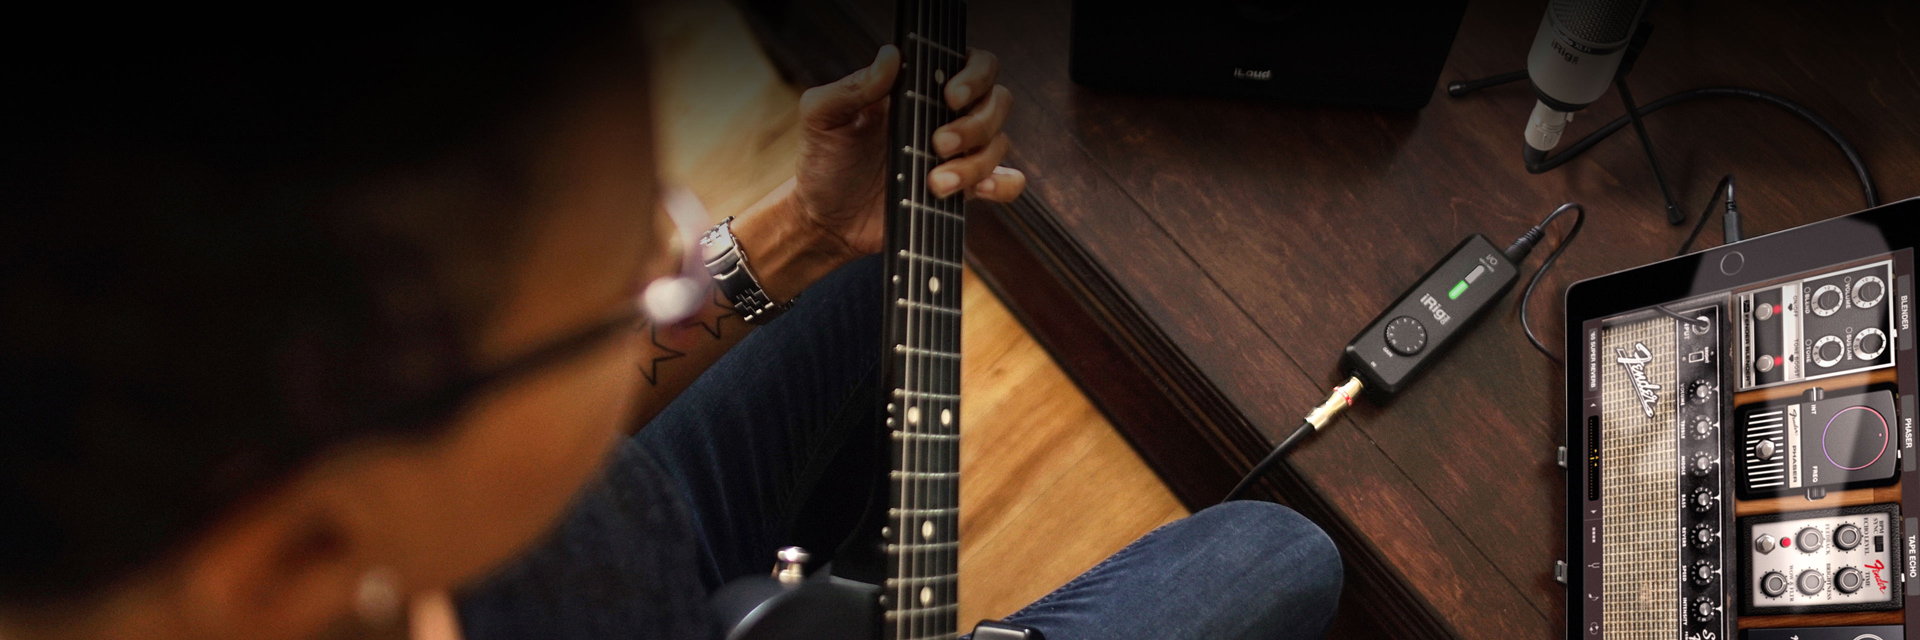 Ik Multimedia Irig Pro I O Acoustic Guitar Jack Wiring Diagram Battery Your New Pocket Sized Mobile Studio